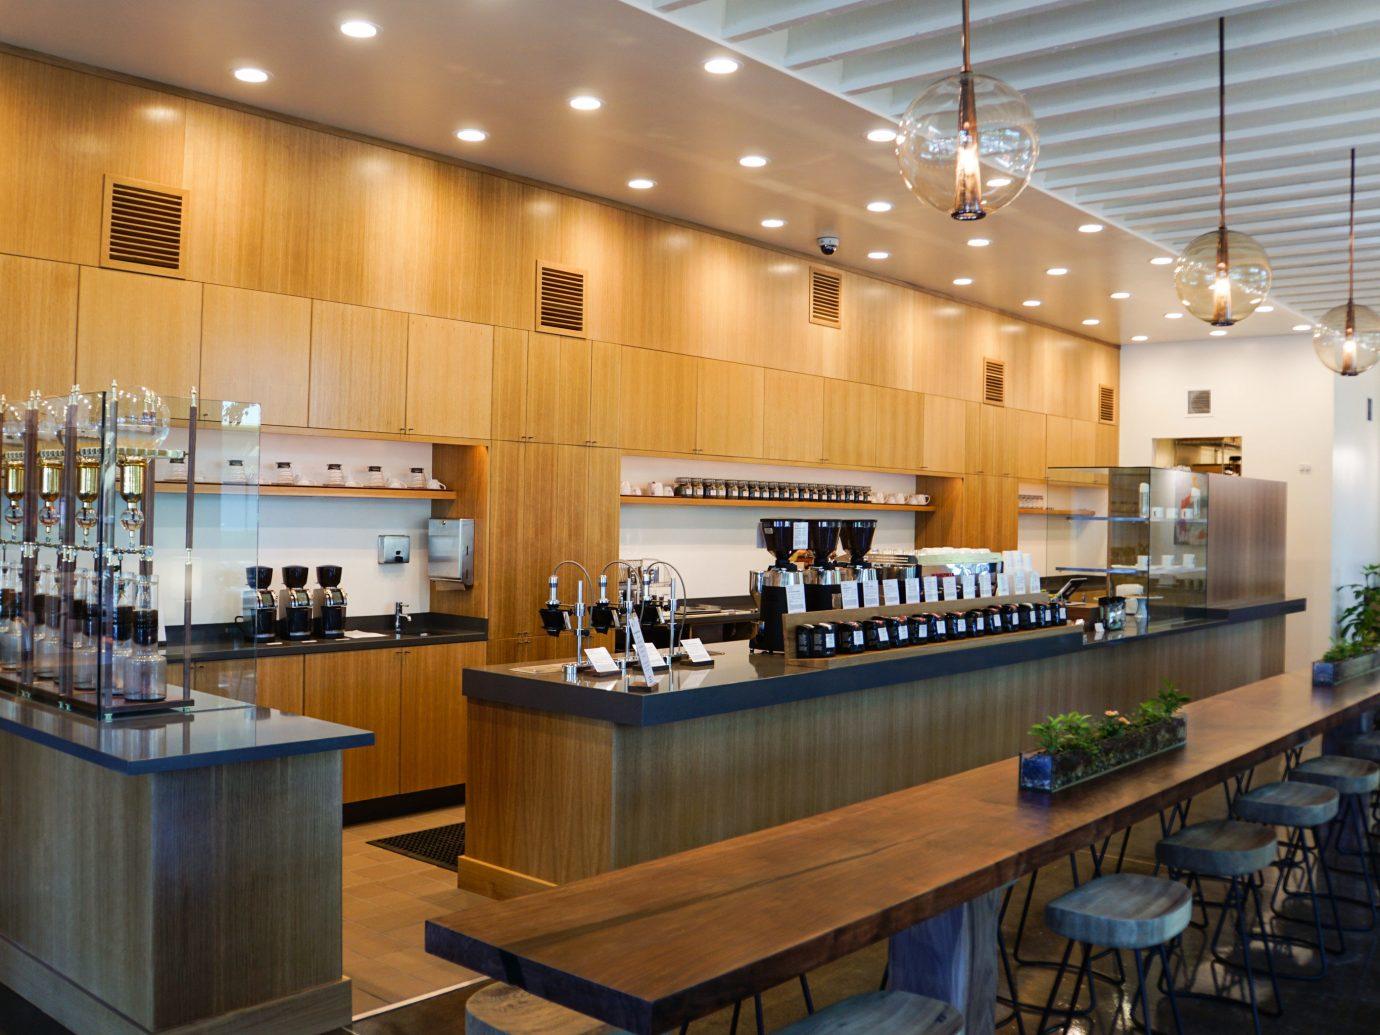 Influencers + Tastemakers indoor floor table ceiling Kitchen wall counter interior design restaurant café cafeteria Island Bar area several